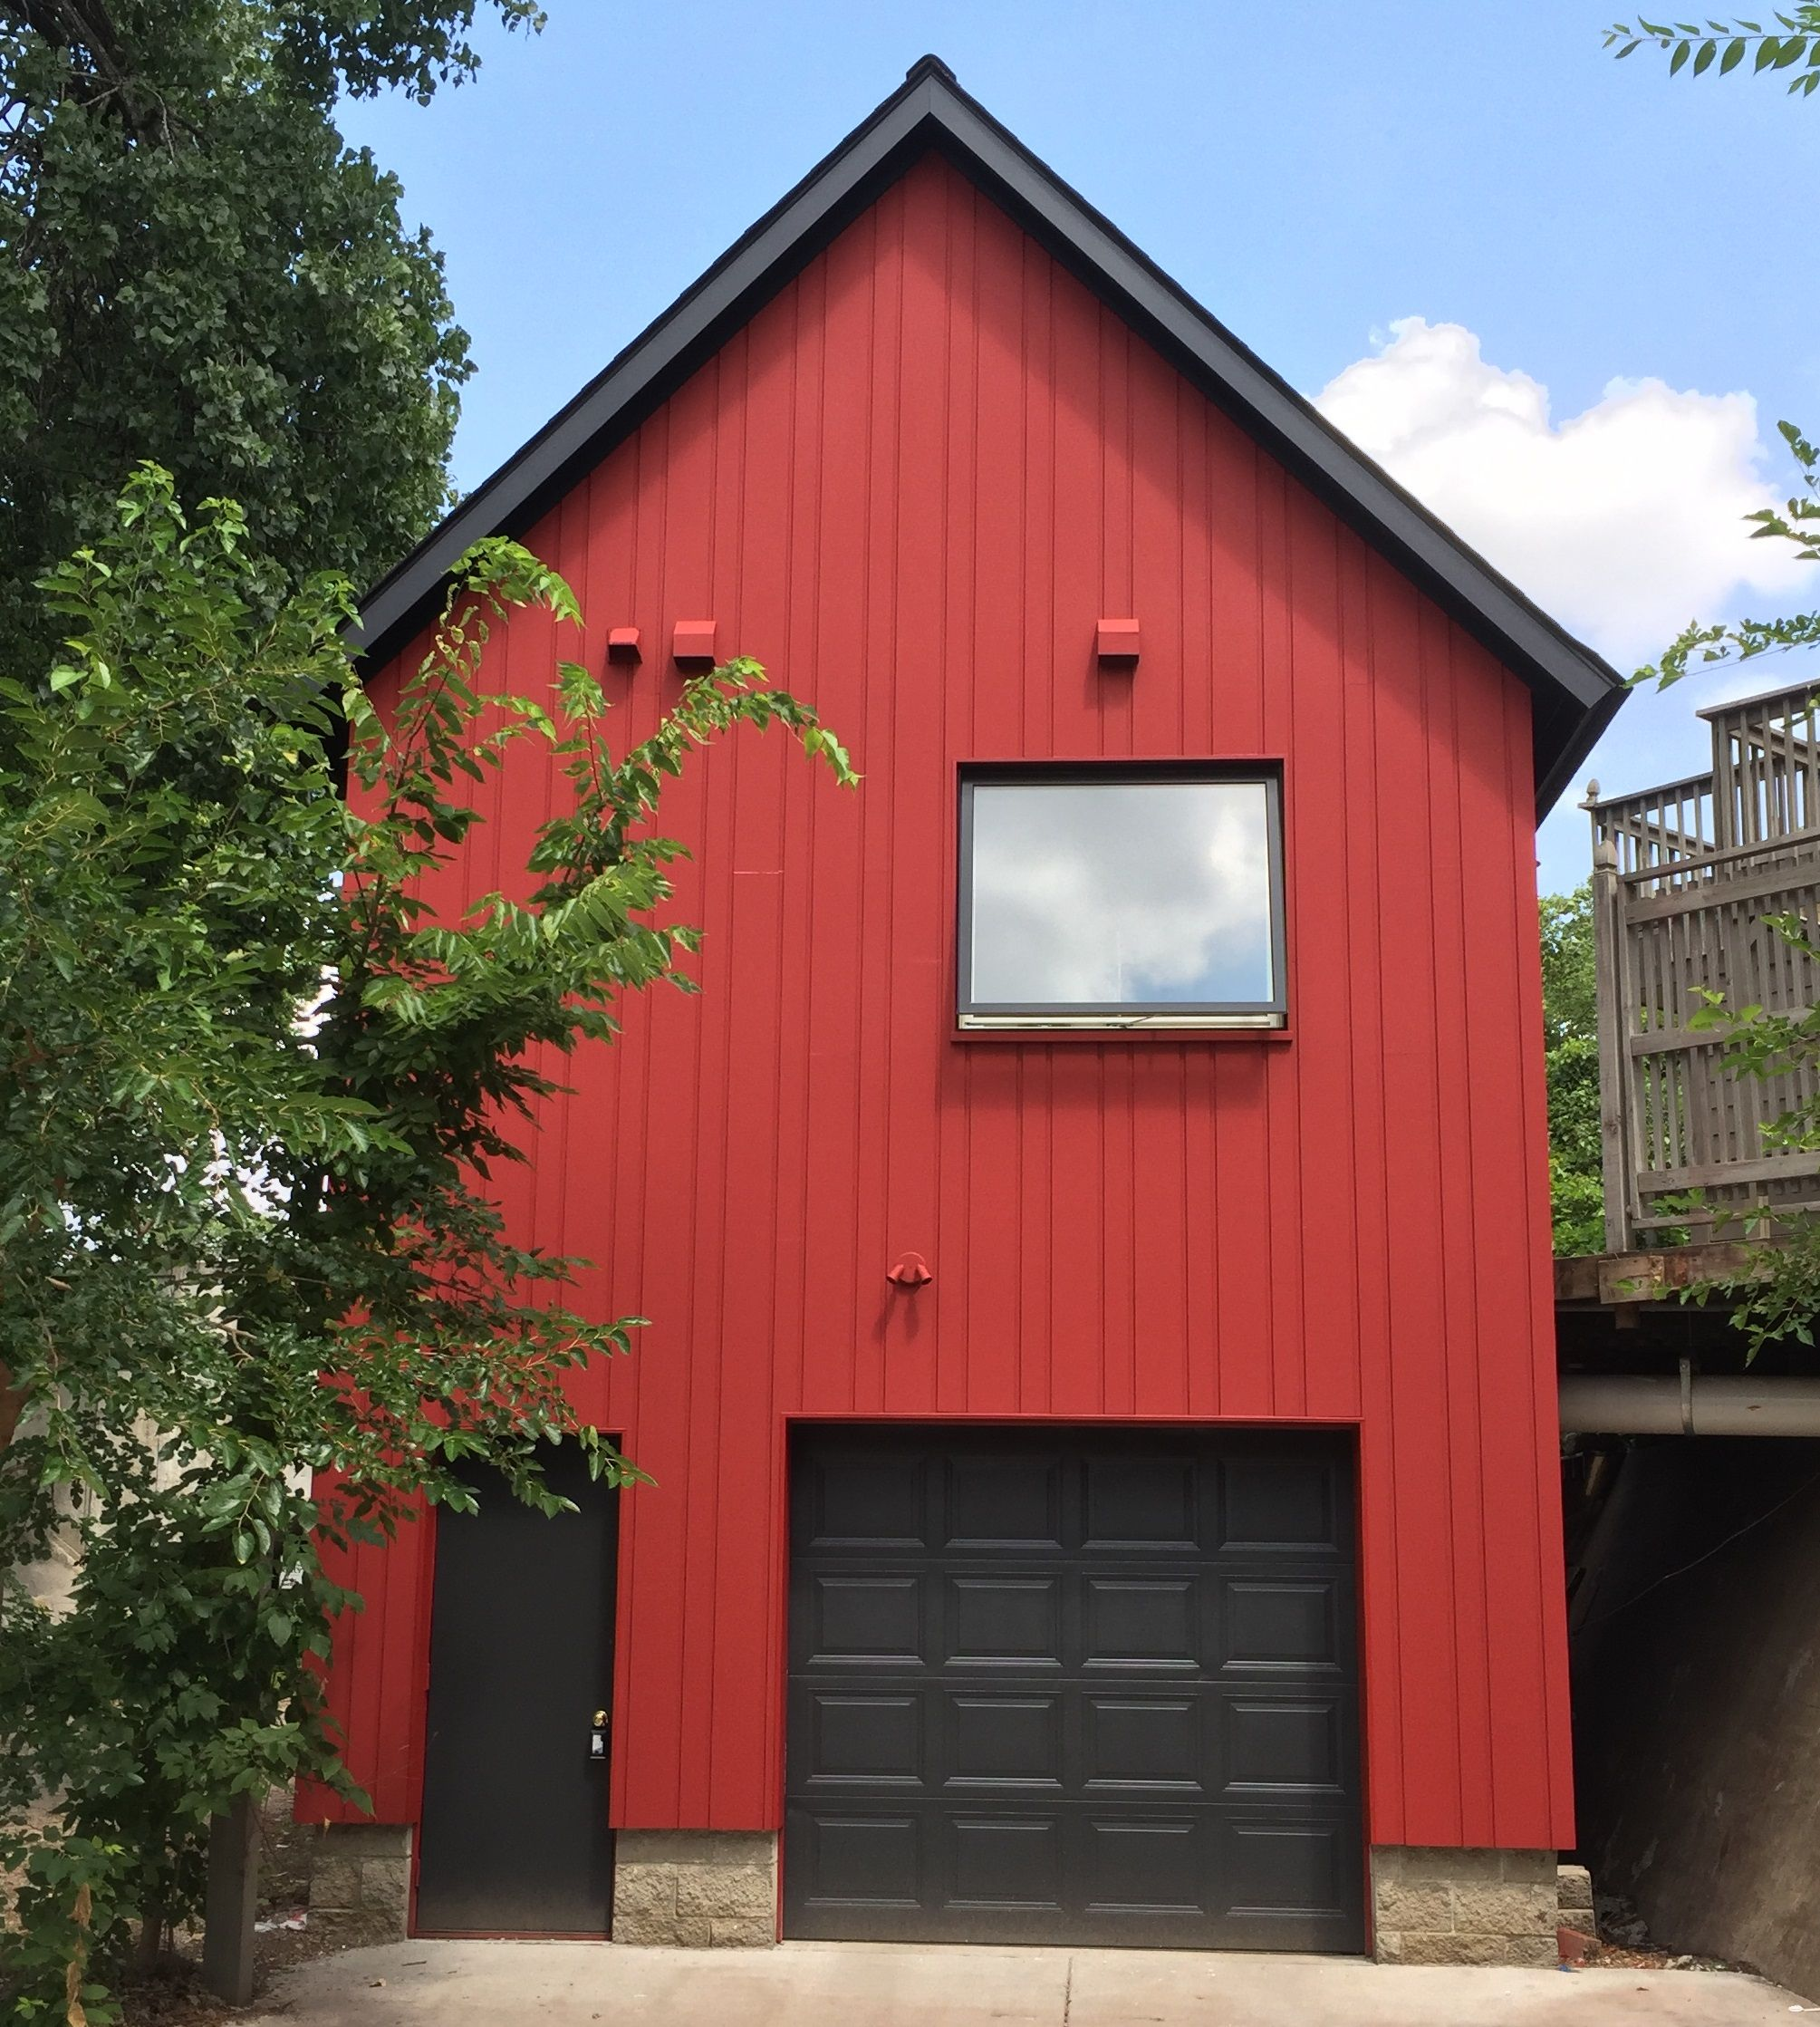 Boral Truexterior Siding Price Google Search Siding Prices House Humidity House Exterior